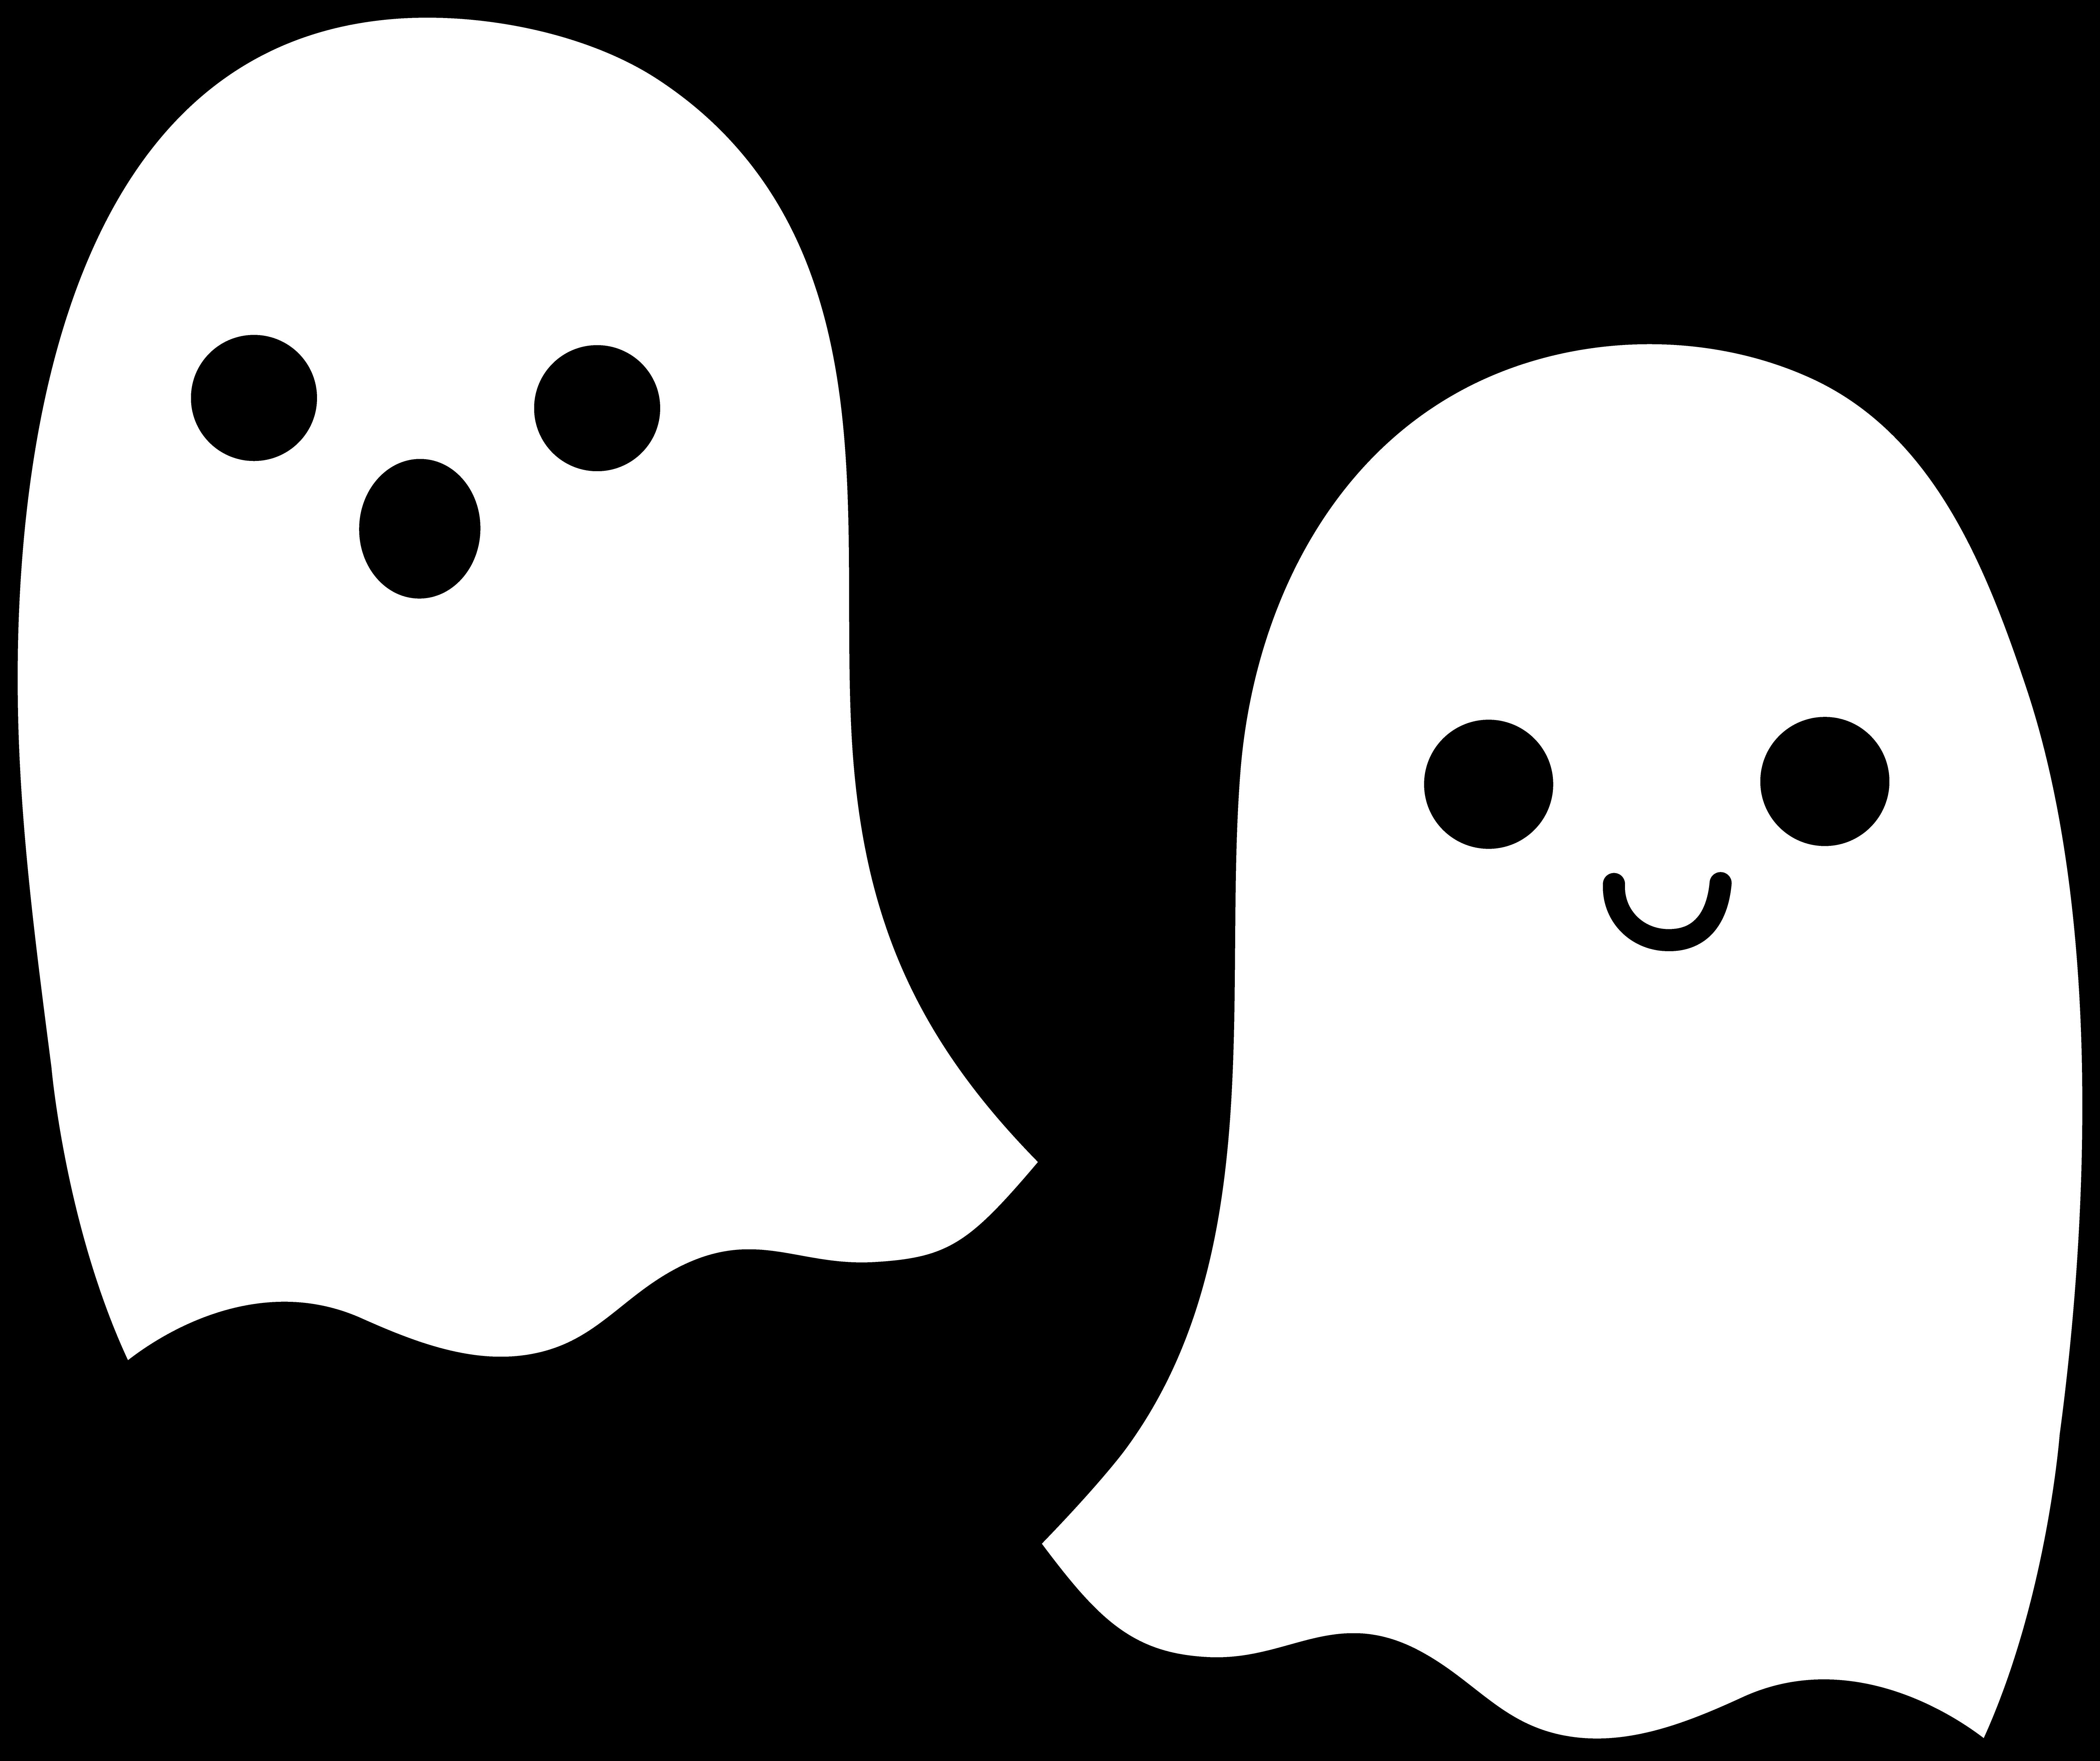 Adorable clipart ghost SCAL SCAL StencilsHalloween SVG Halloween